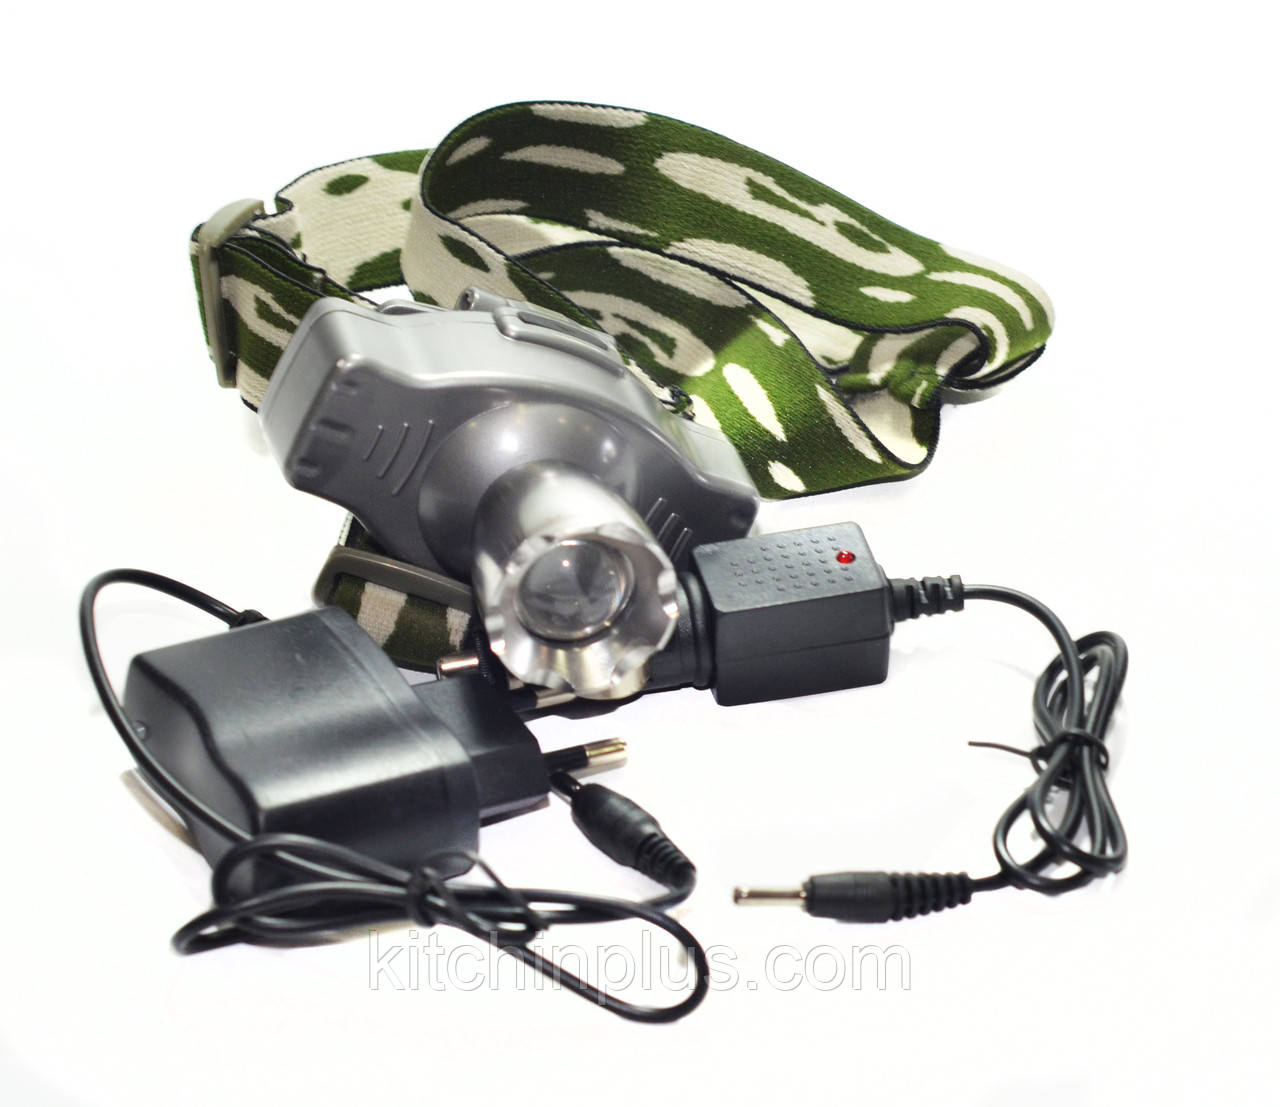 Налобний ліхтар Bailong Police BL-HZ-008 6000W